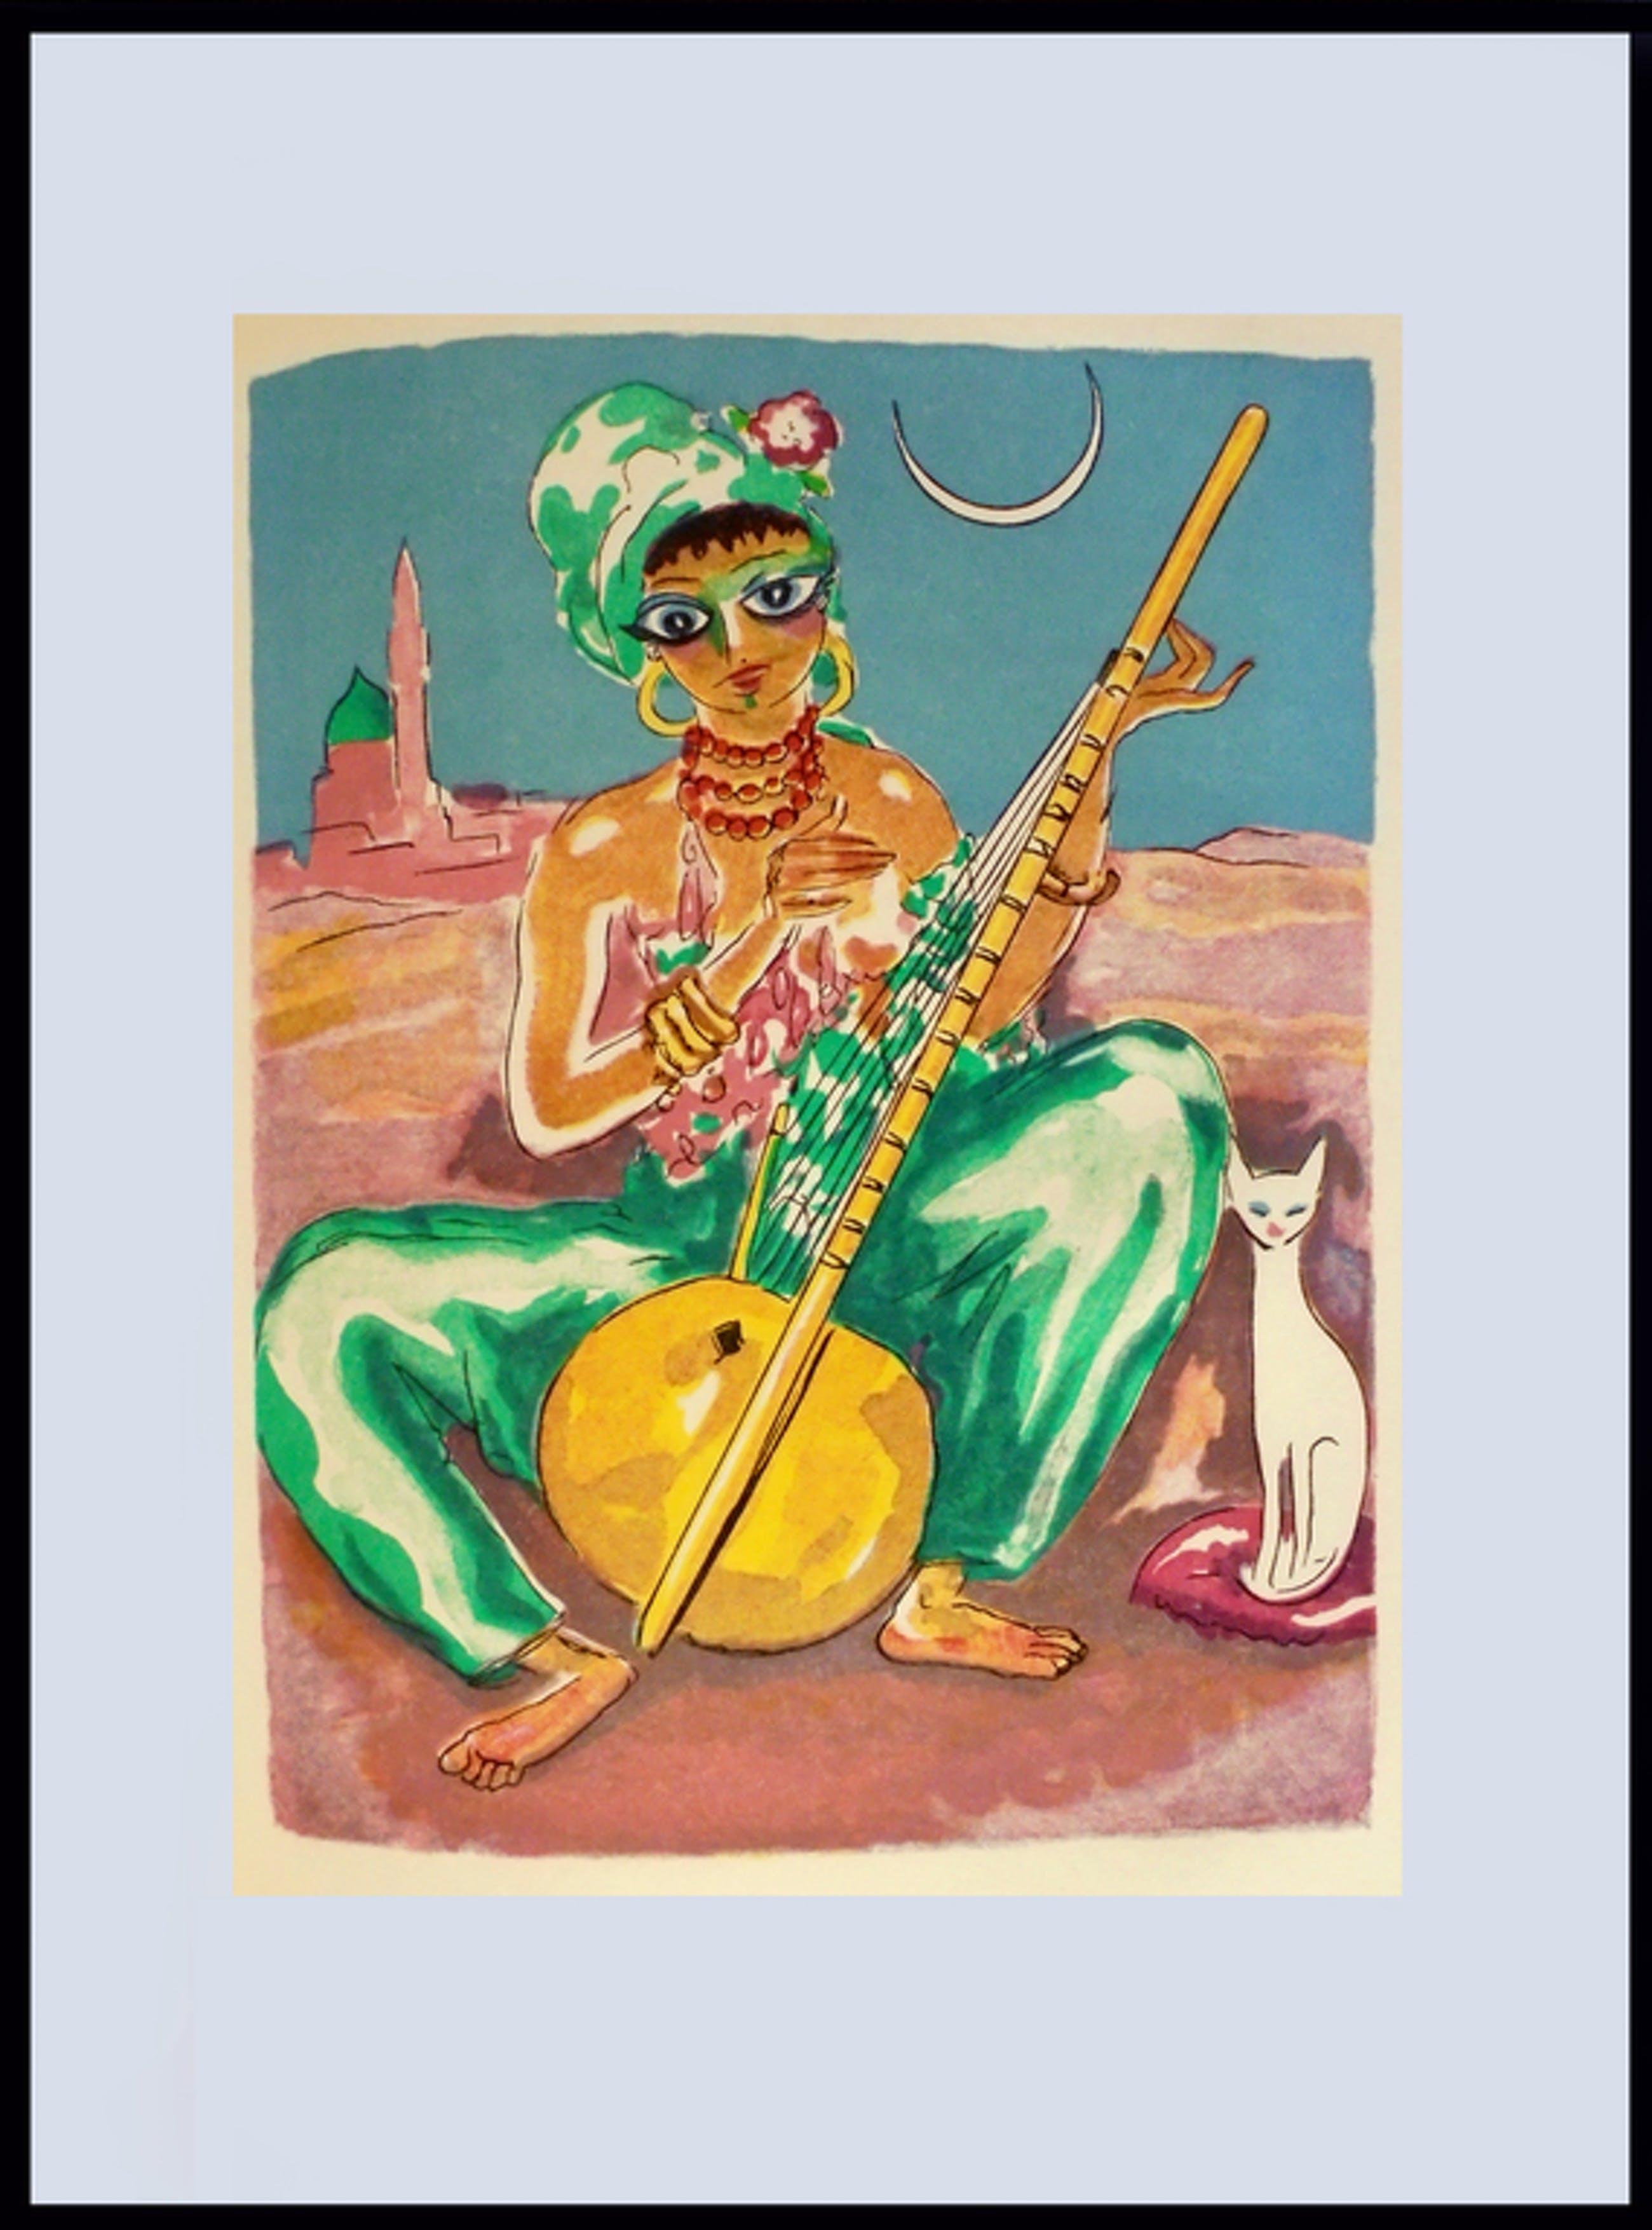 Kees van Dongen - Houtgravure 1955 - Zobèida chante pour Ghanem kopen? Bied vanaf 25!